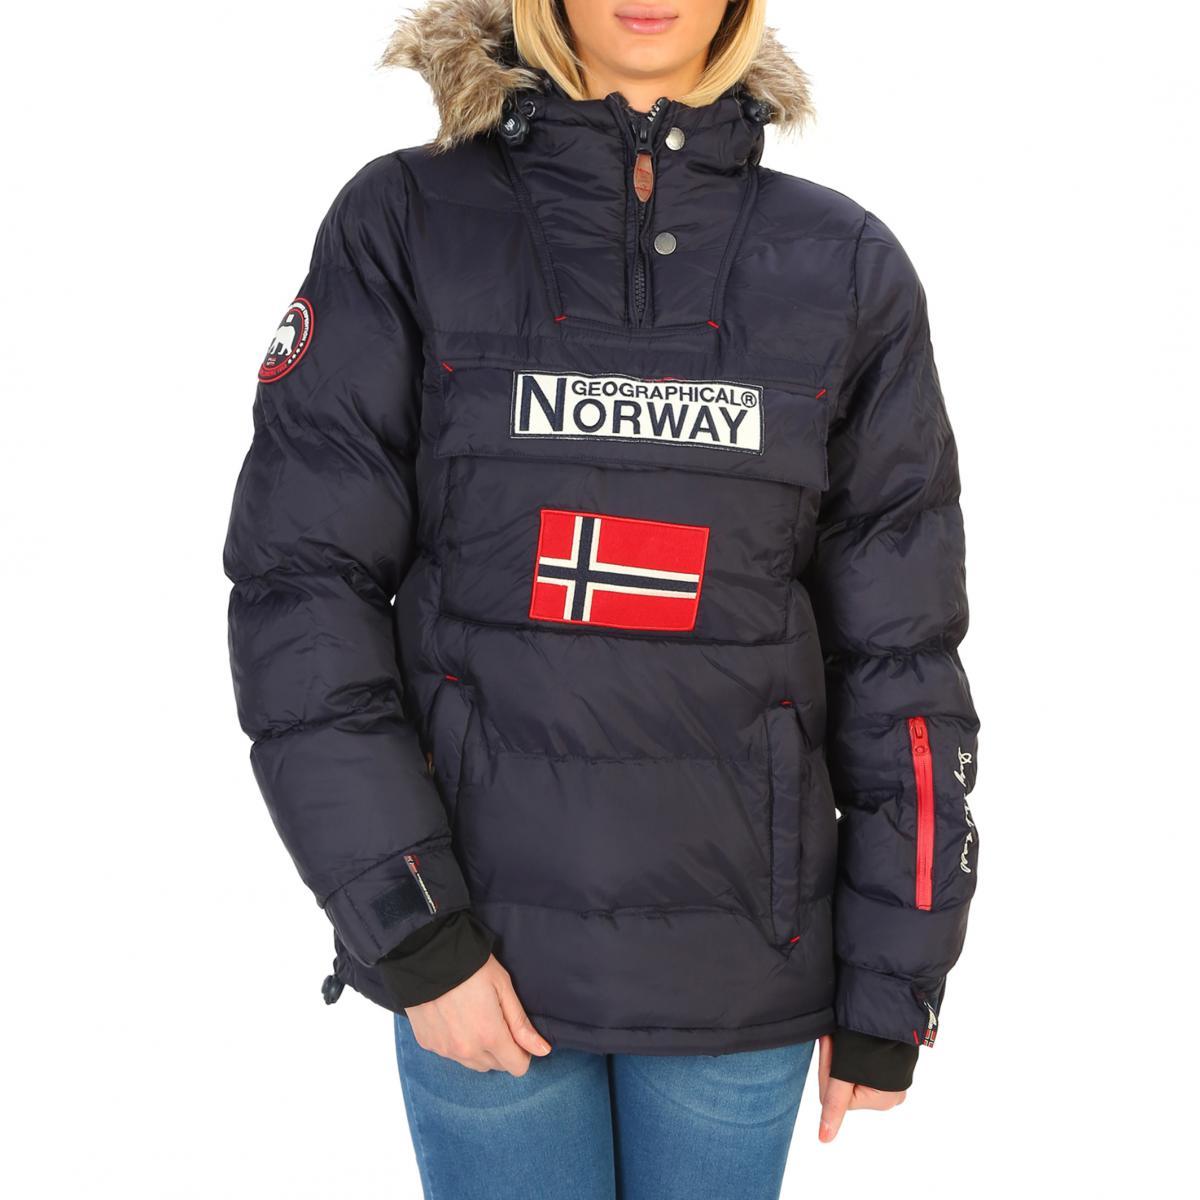 b9dca2af6aade Abrigo canguro mujer - Geographical Norway España ®